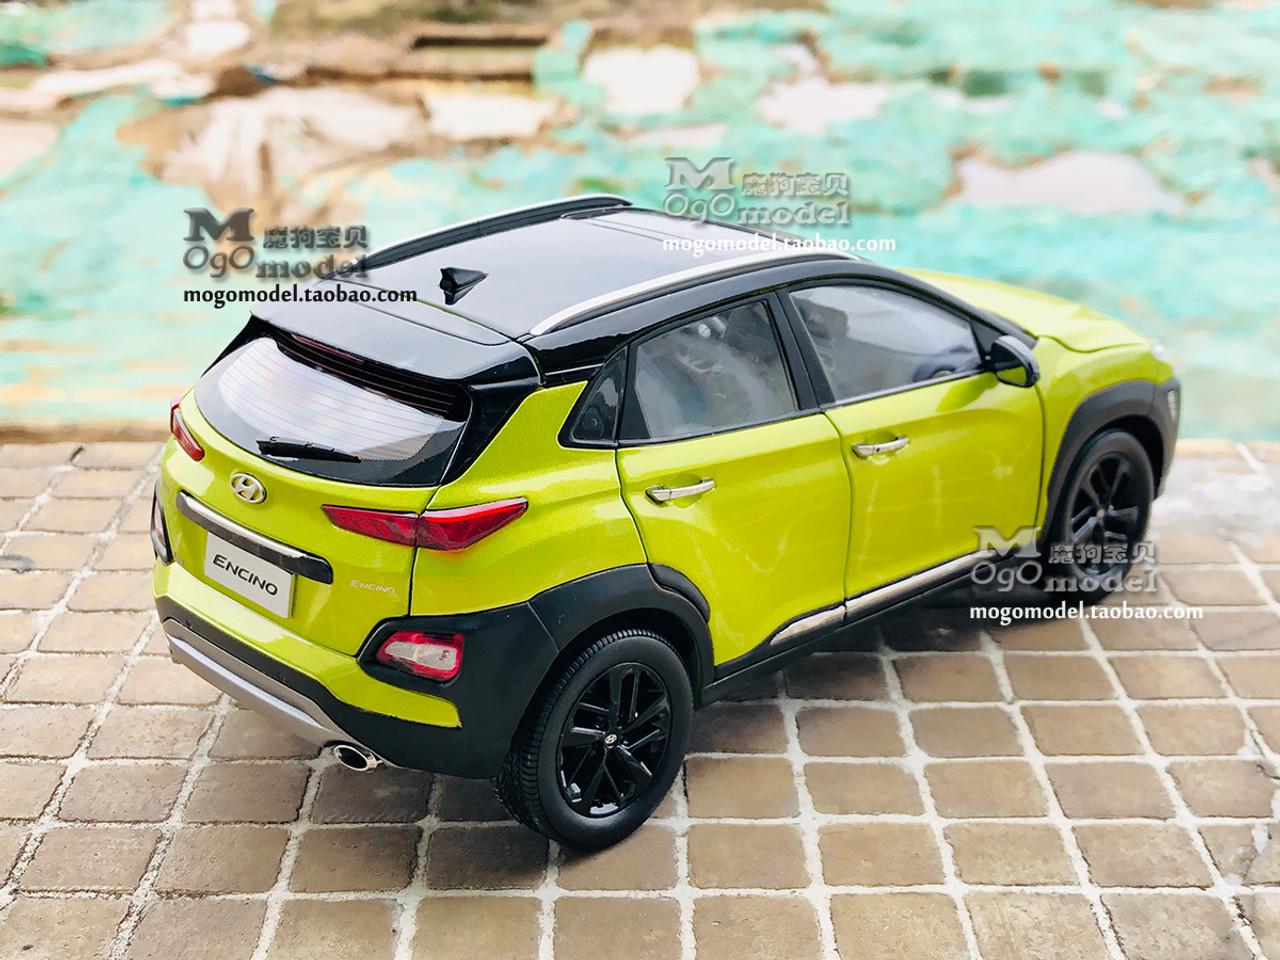 1/18 Dealer Edition Hyundai Encino / Kona (Yellow) Diecast Car Model